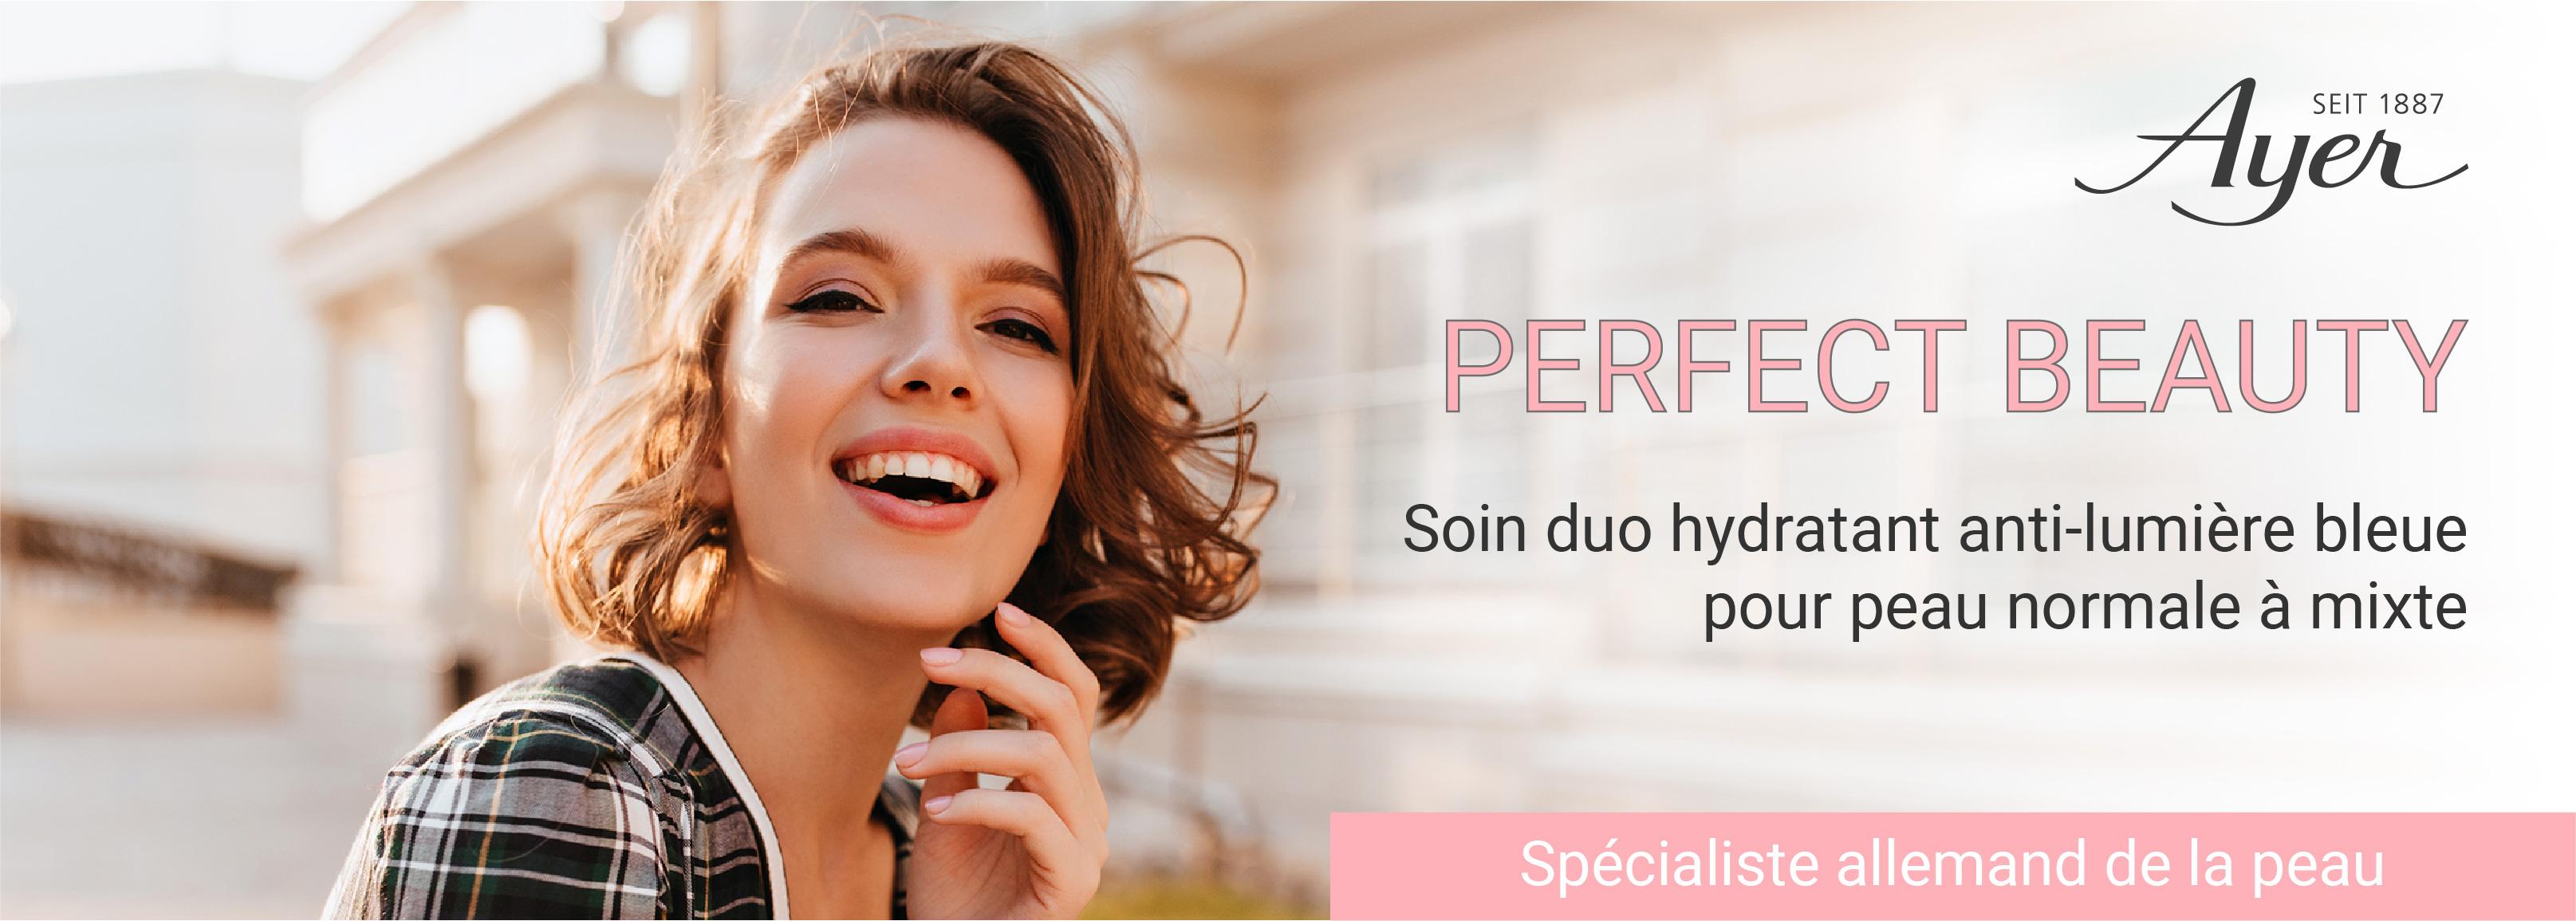 Ayer_Linien_PerfectBeauty_FR_Slider_2500x893px_RGB_V1-0